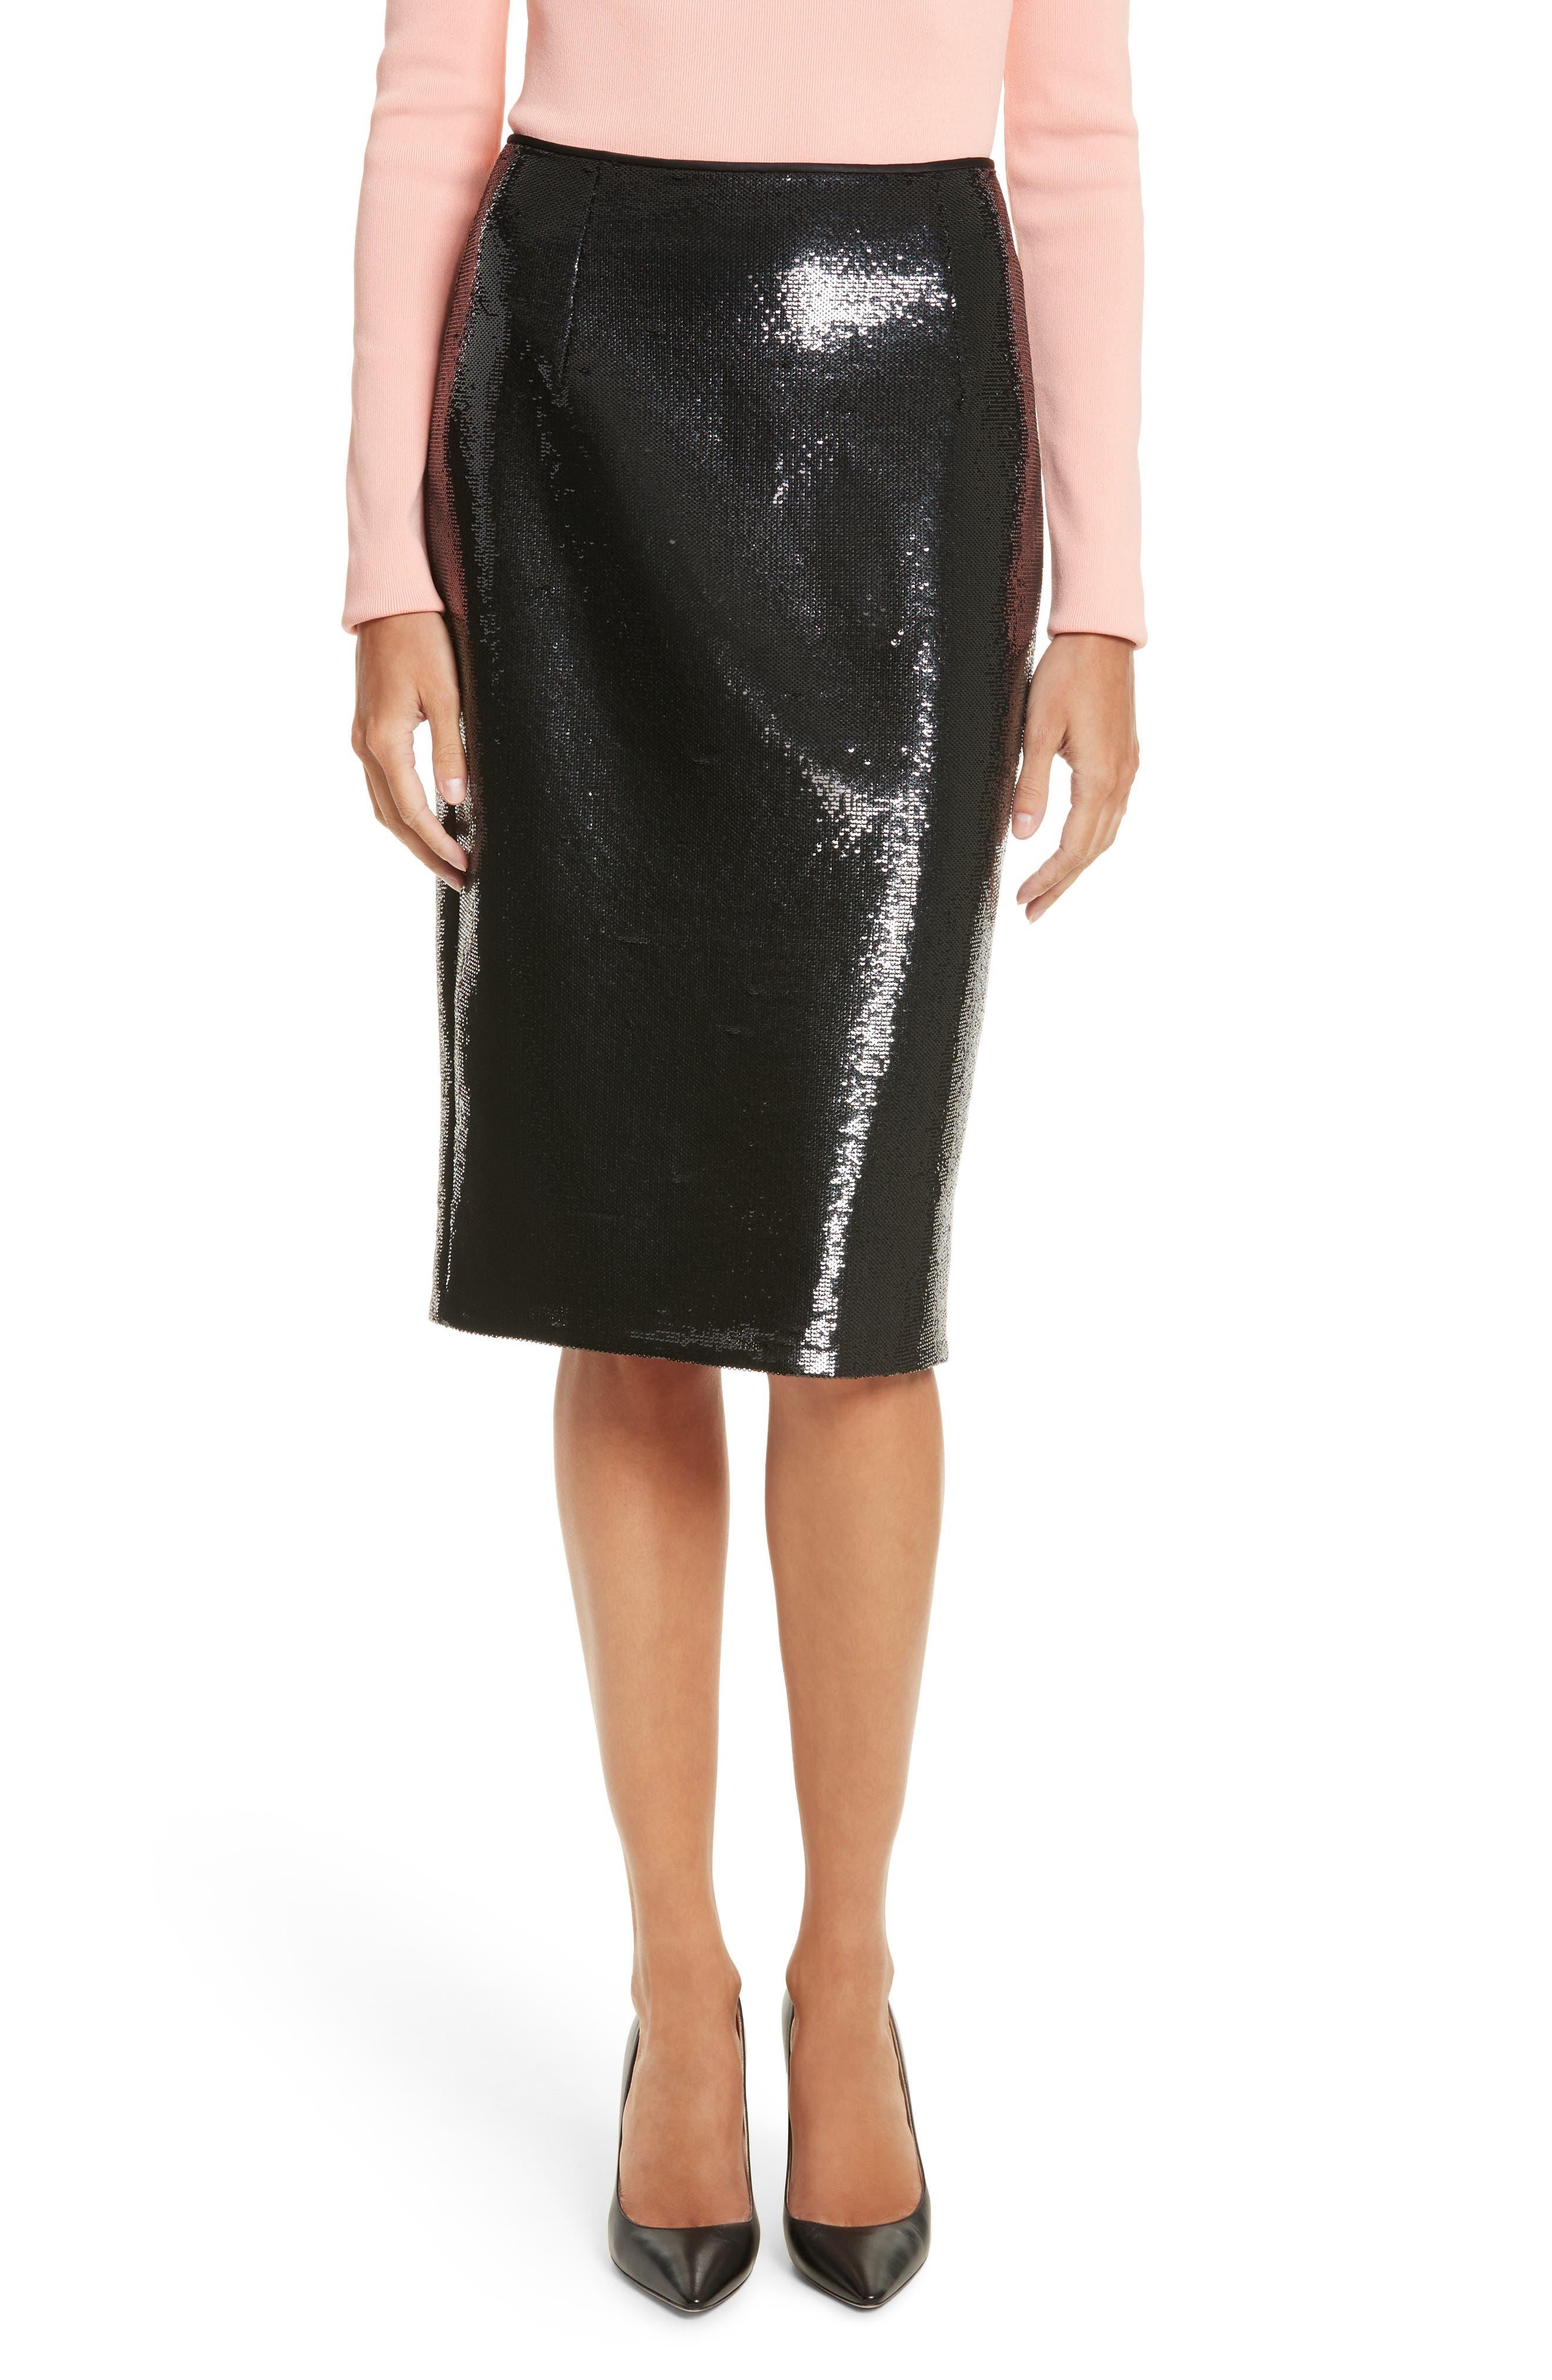 Diane von Furstenberg Sequin Pencil Skirt,                         Main,                         color, Black